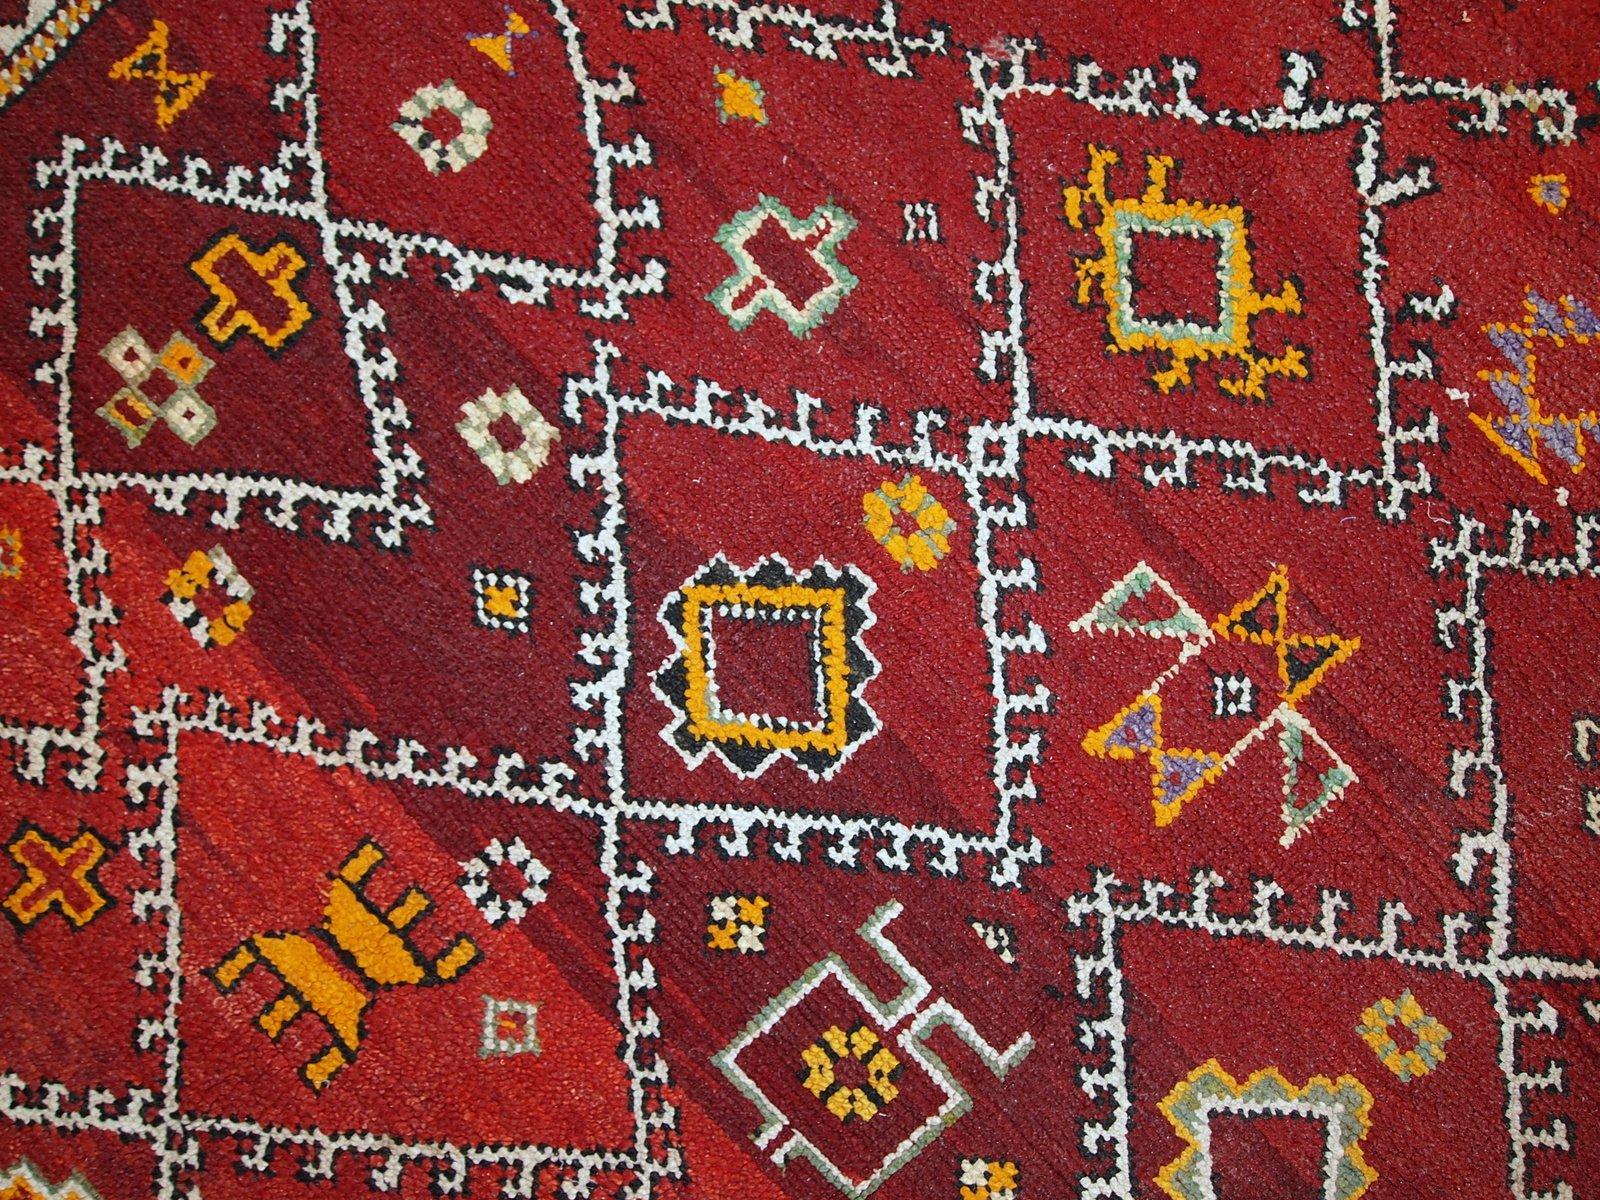 handgemachter antiker marokkanischer berber teppich. Black Bedroom Furniture Sets. Home Design Ideas